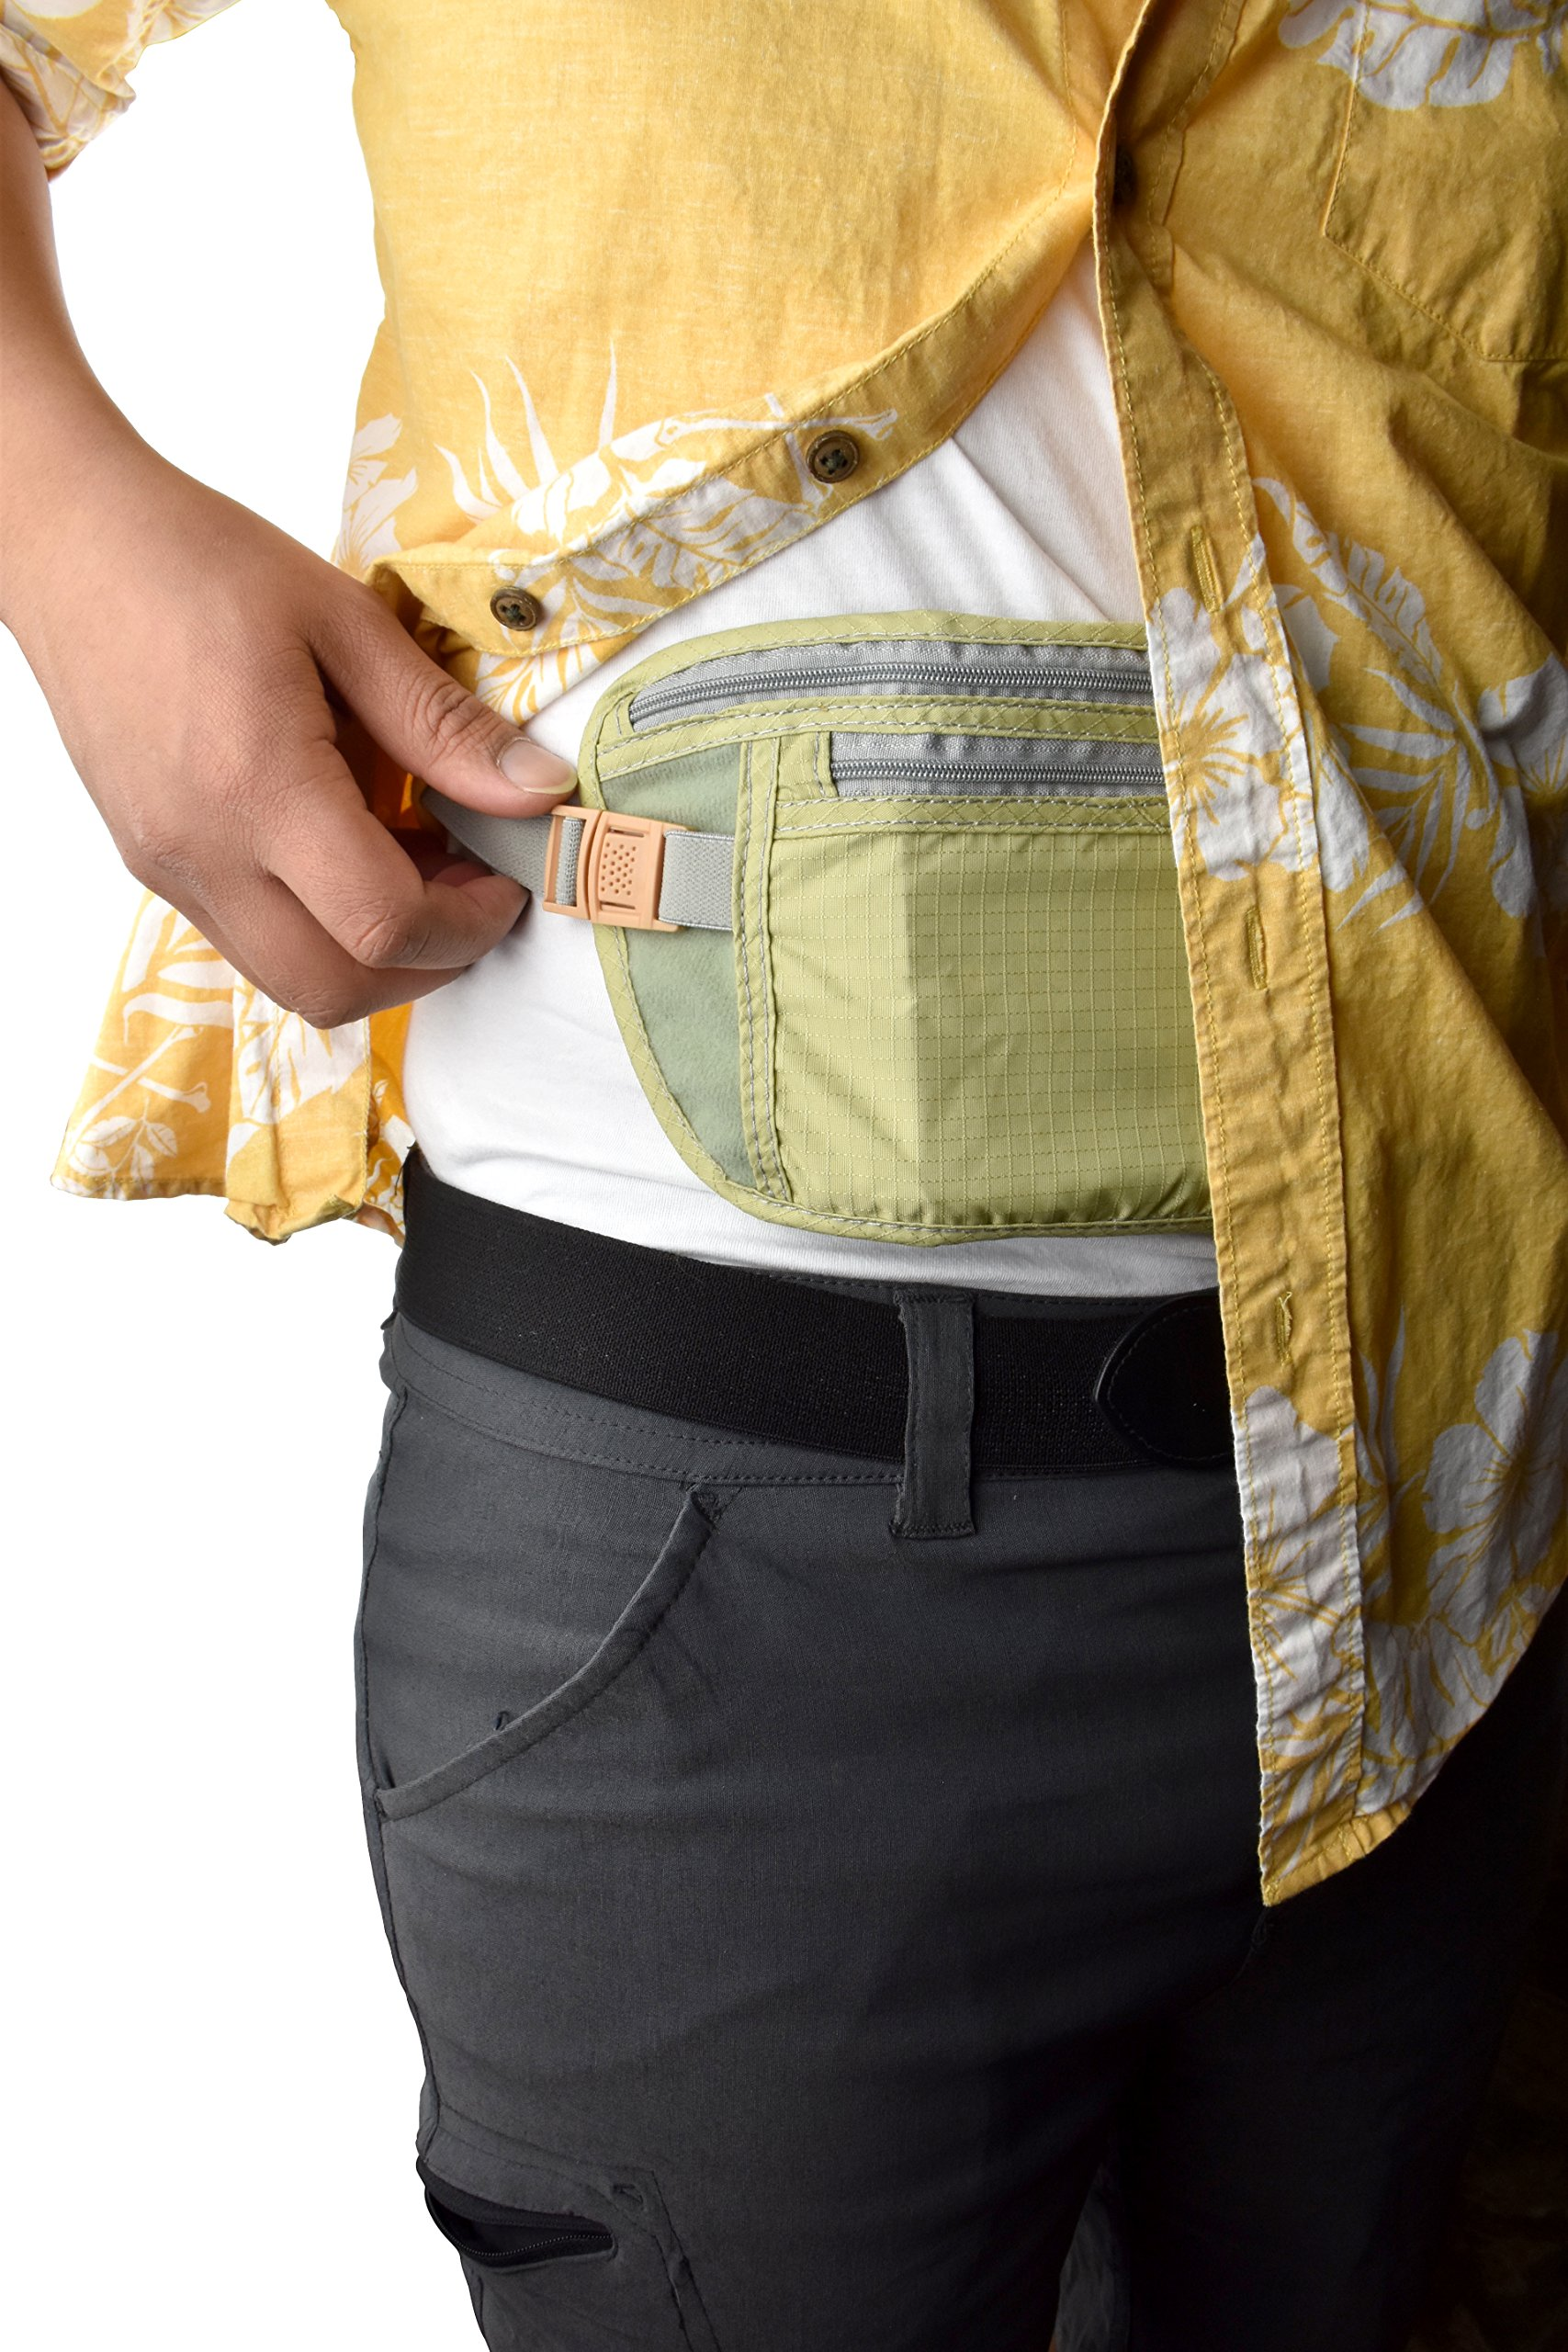 SE TP101-POUCH Concealed Dual Zipper Travel Pouch by SE (Image #5)